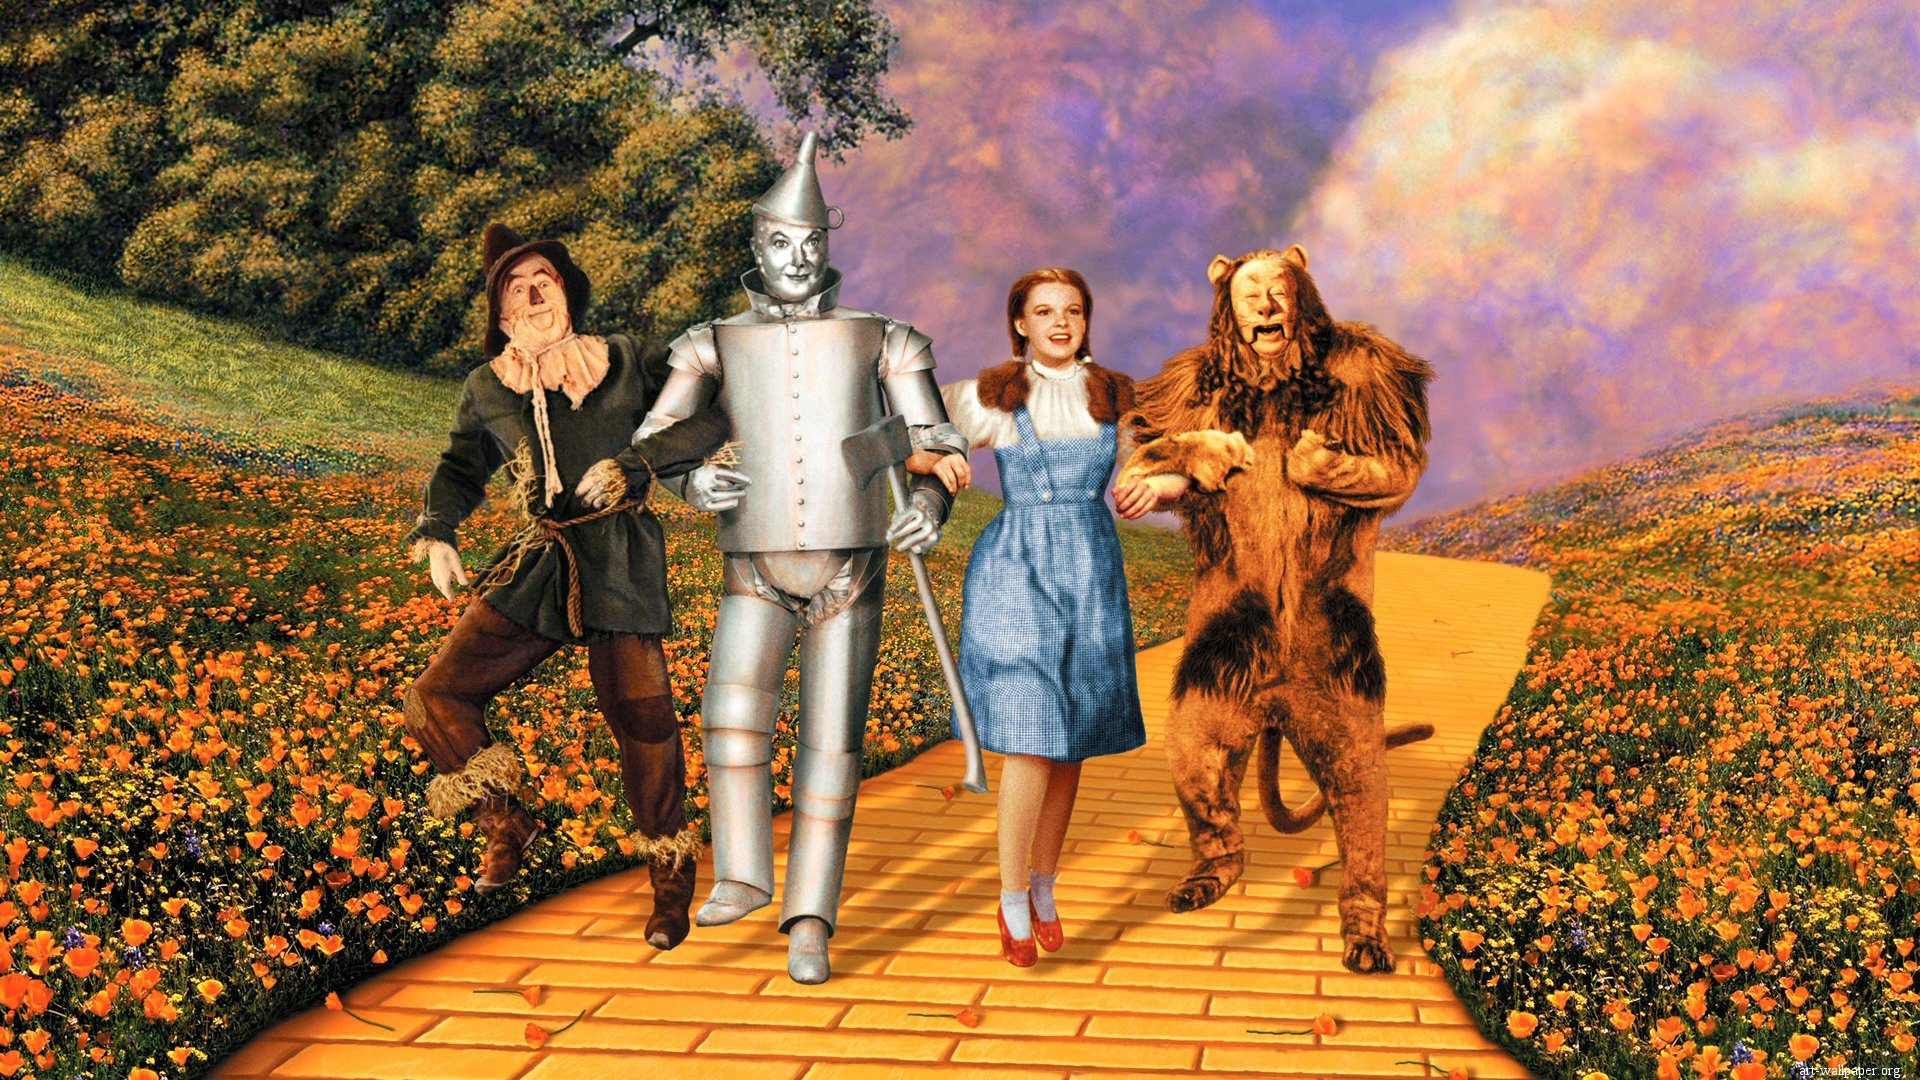 Wizard Of Oz Wallpaper